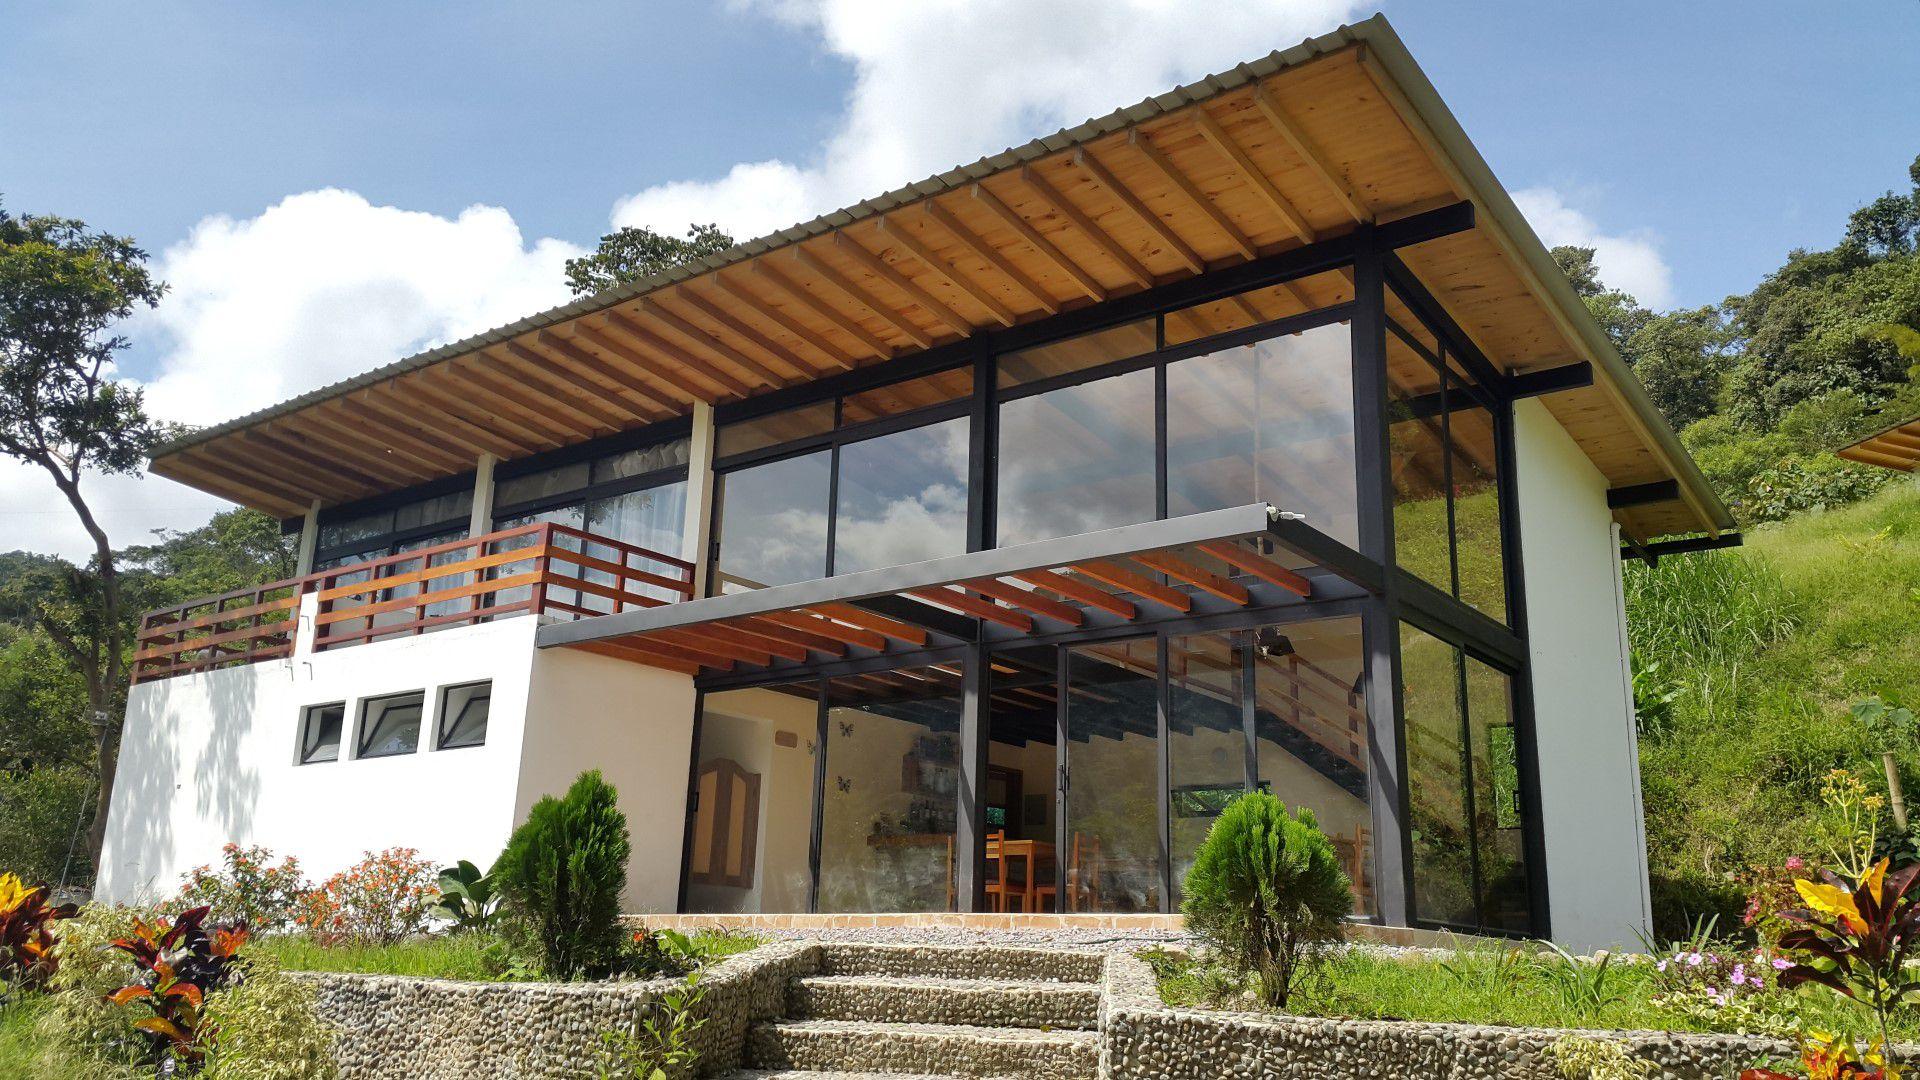 mindo ecuador hotels cloud forest birding las terrazas de dana